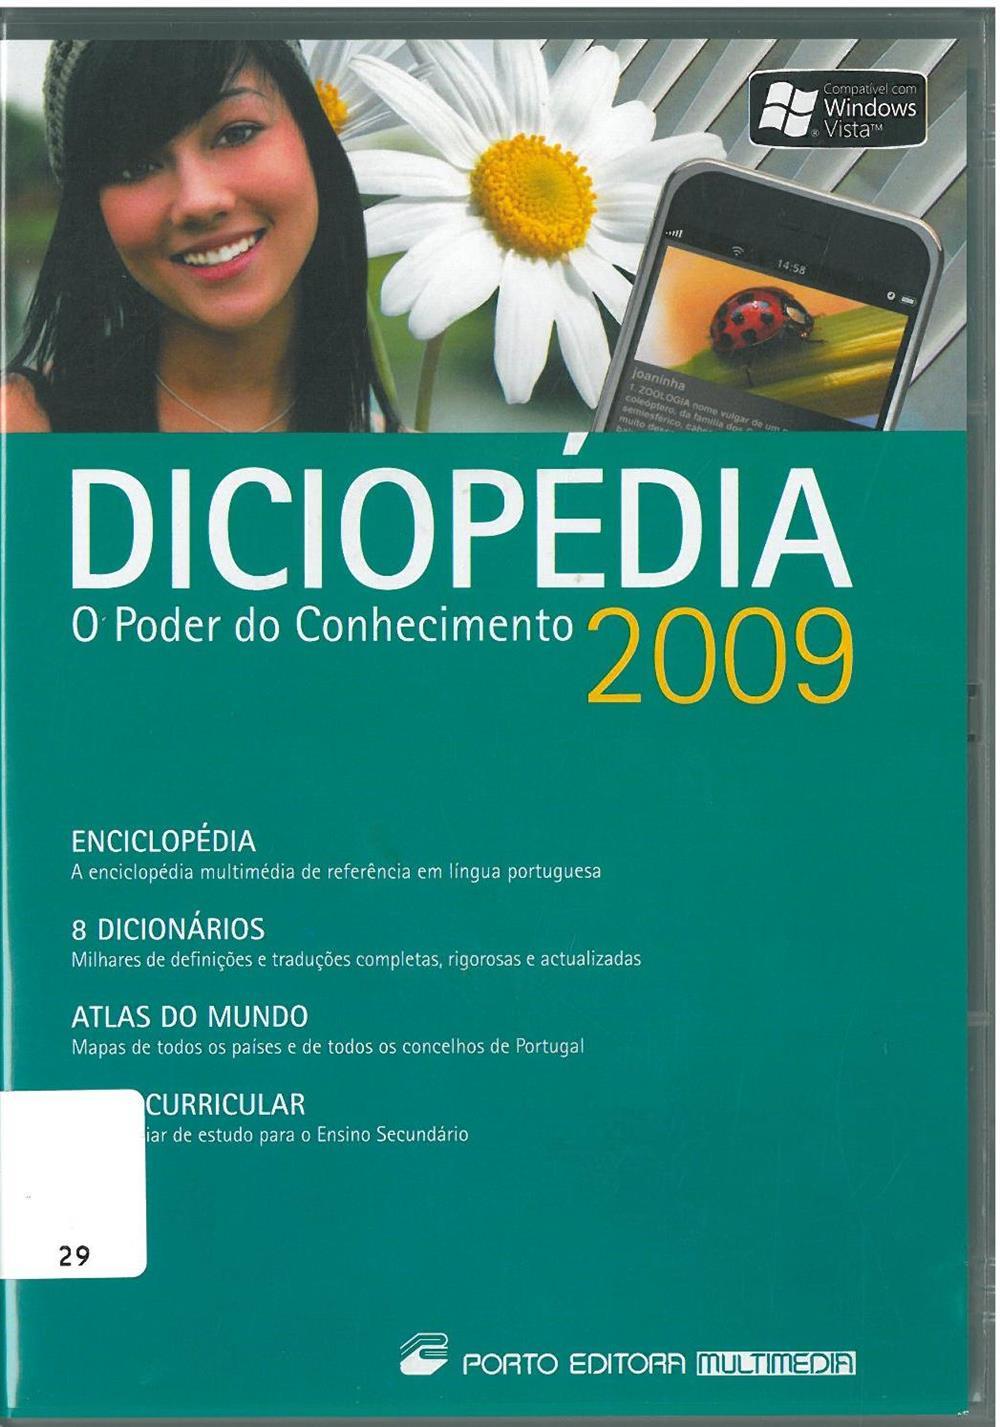 Diciopédia 2009_DVD-Rom.jpg